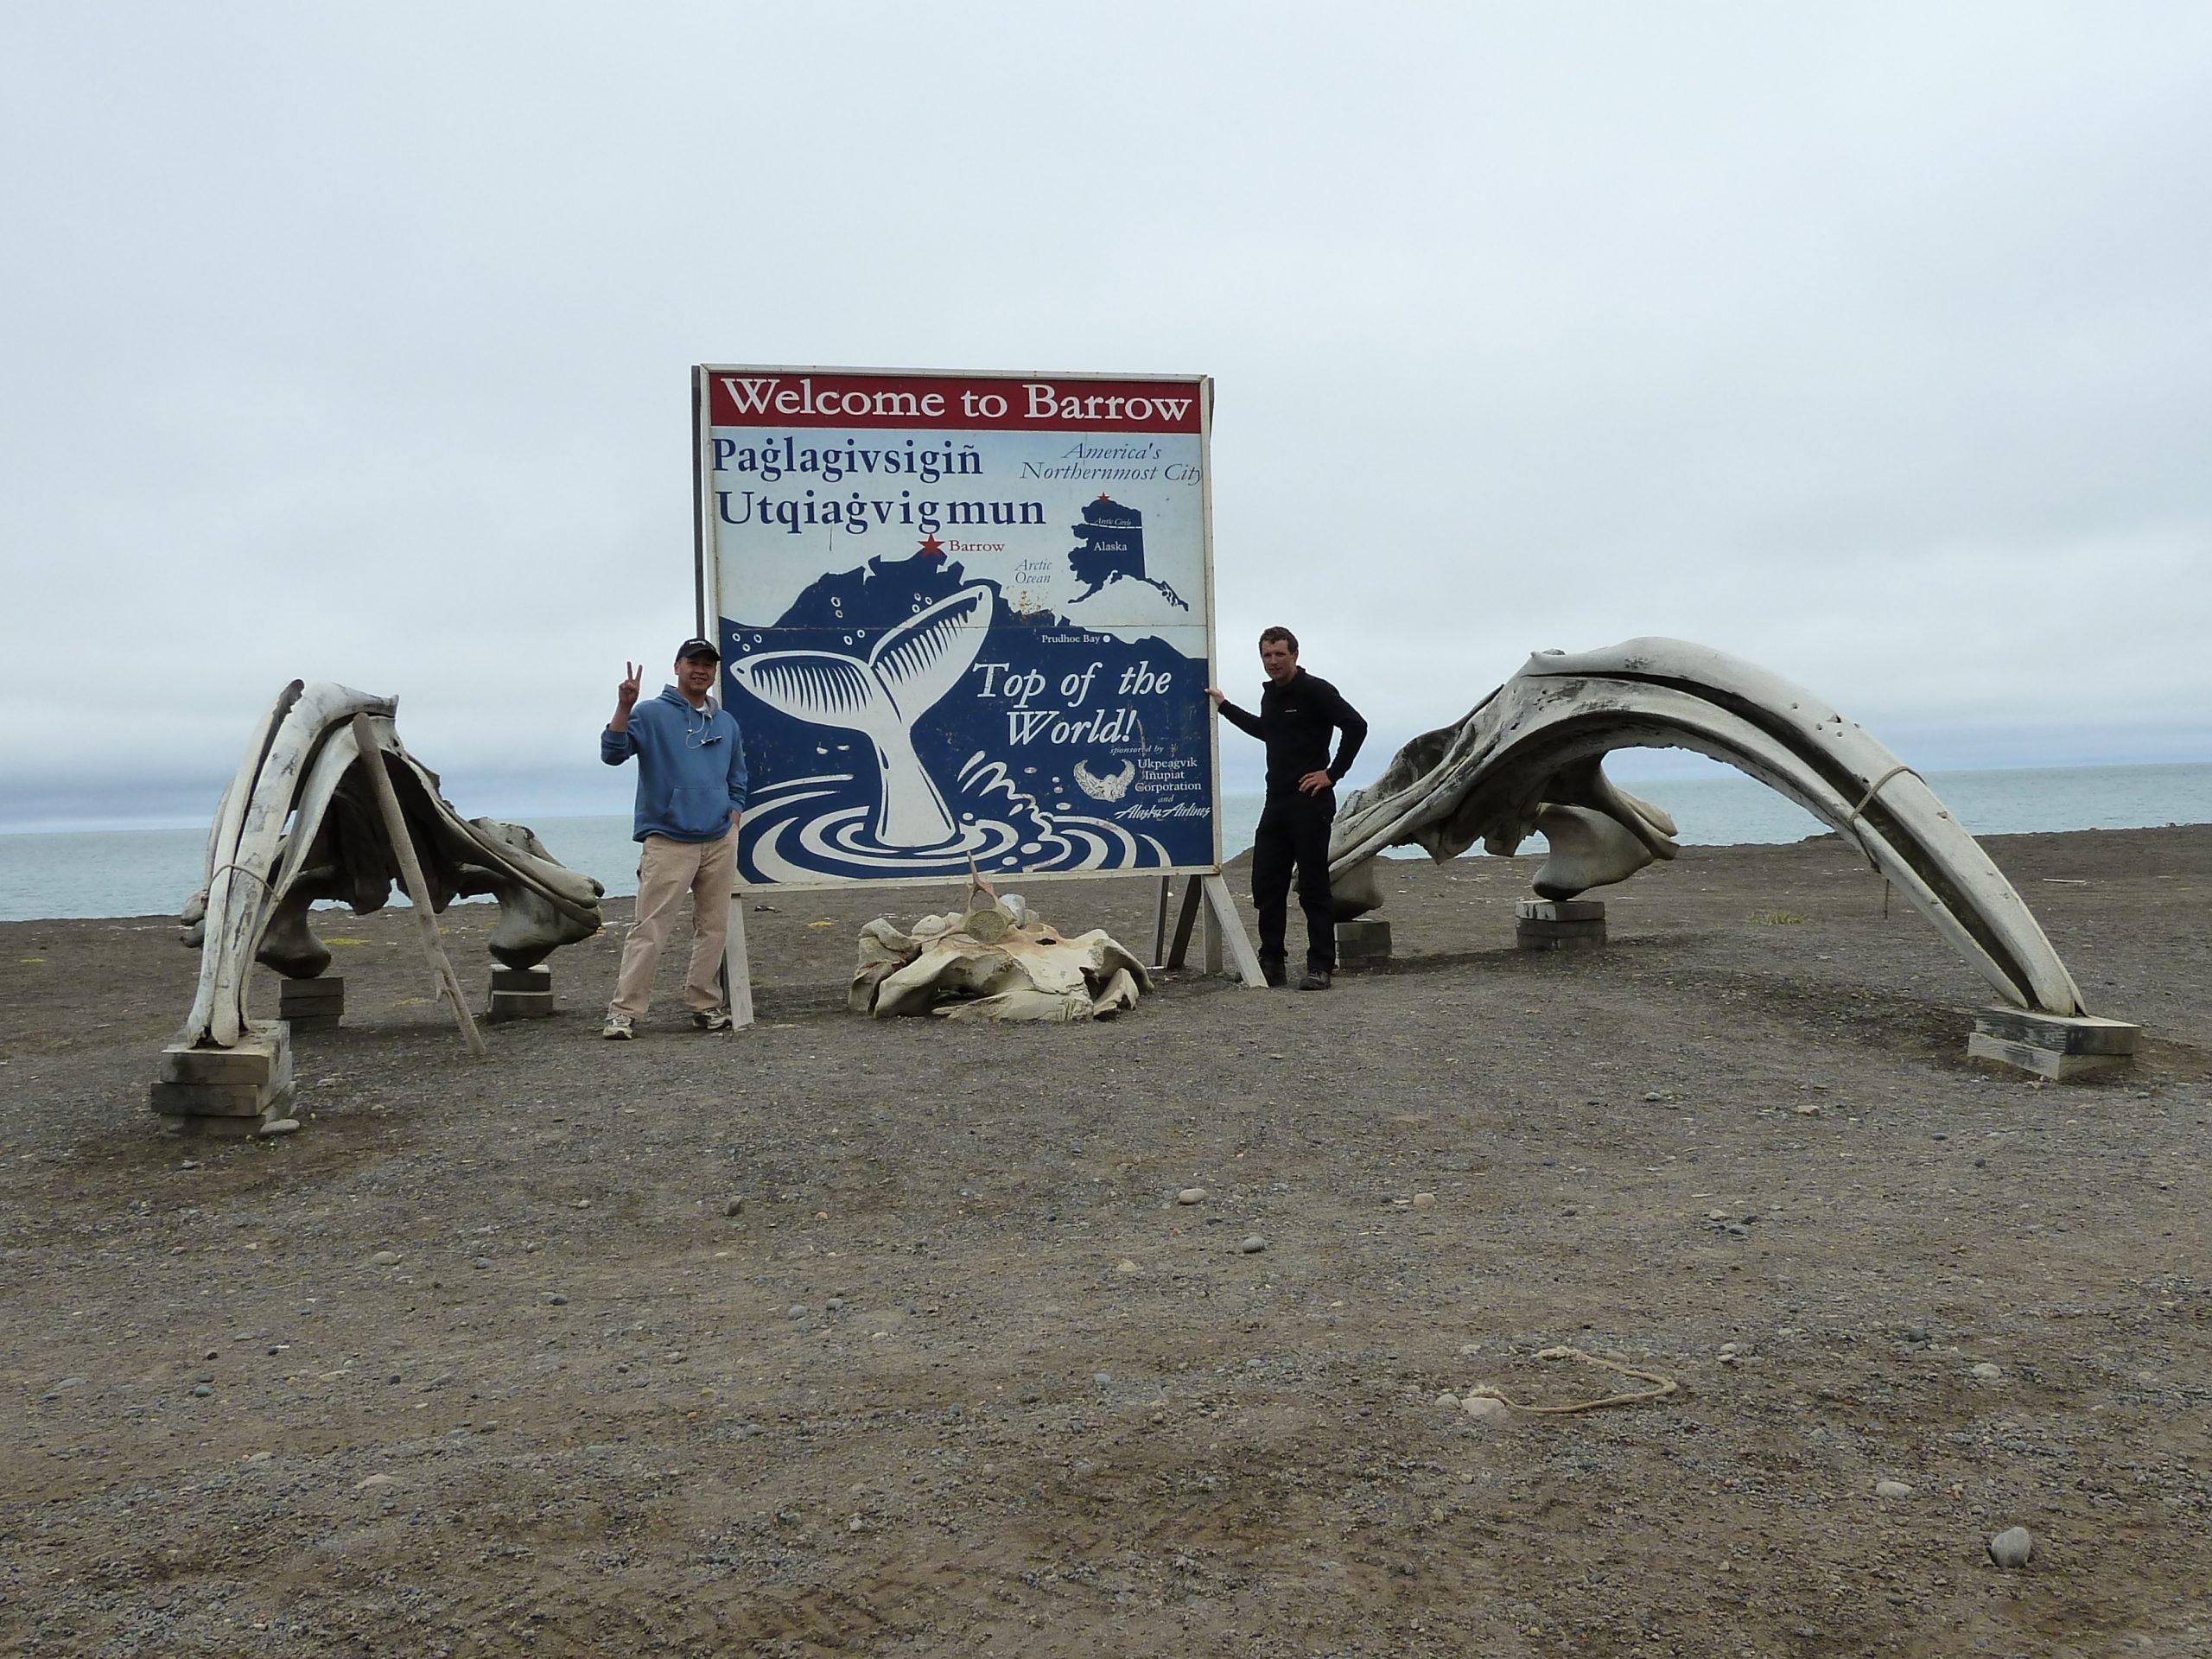 Radreise Alaska 2010 - Walknochen am Strand bei Barrow